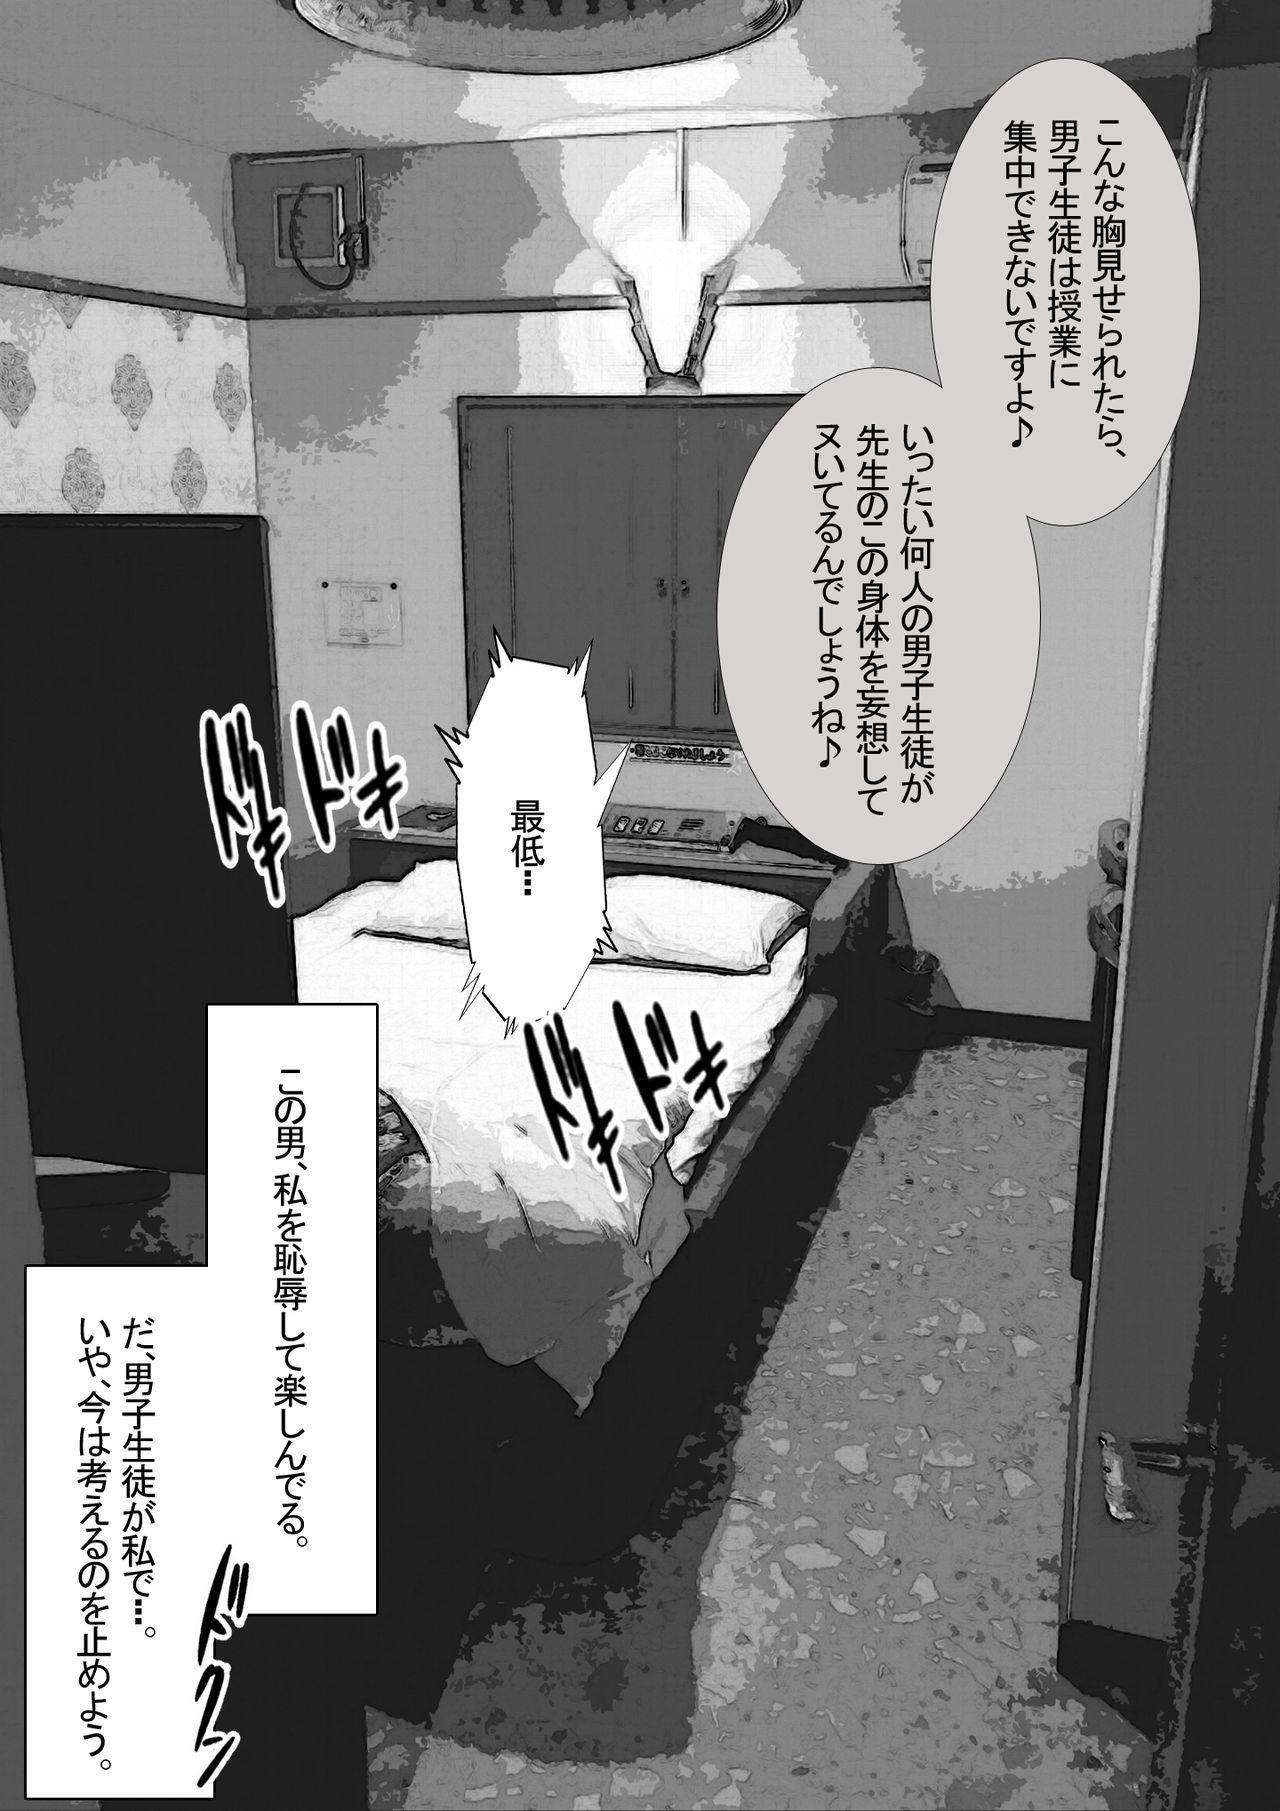 市ノ瀬美加子の場合 40